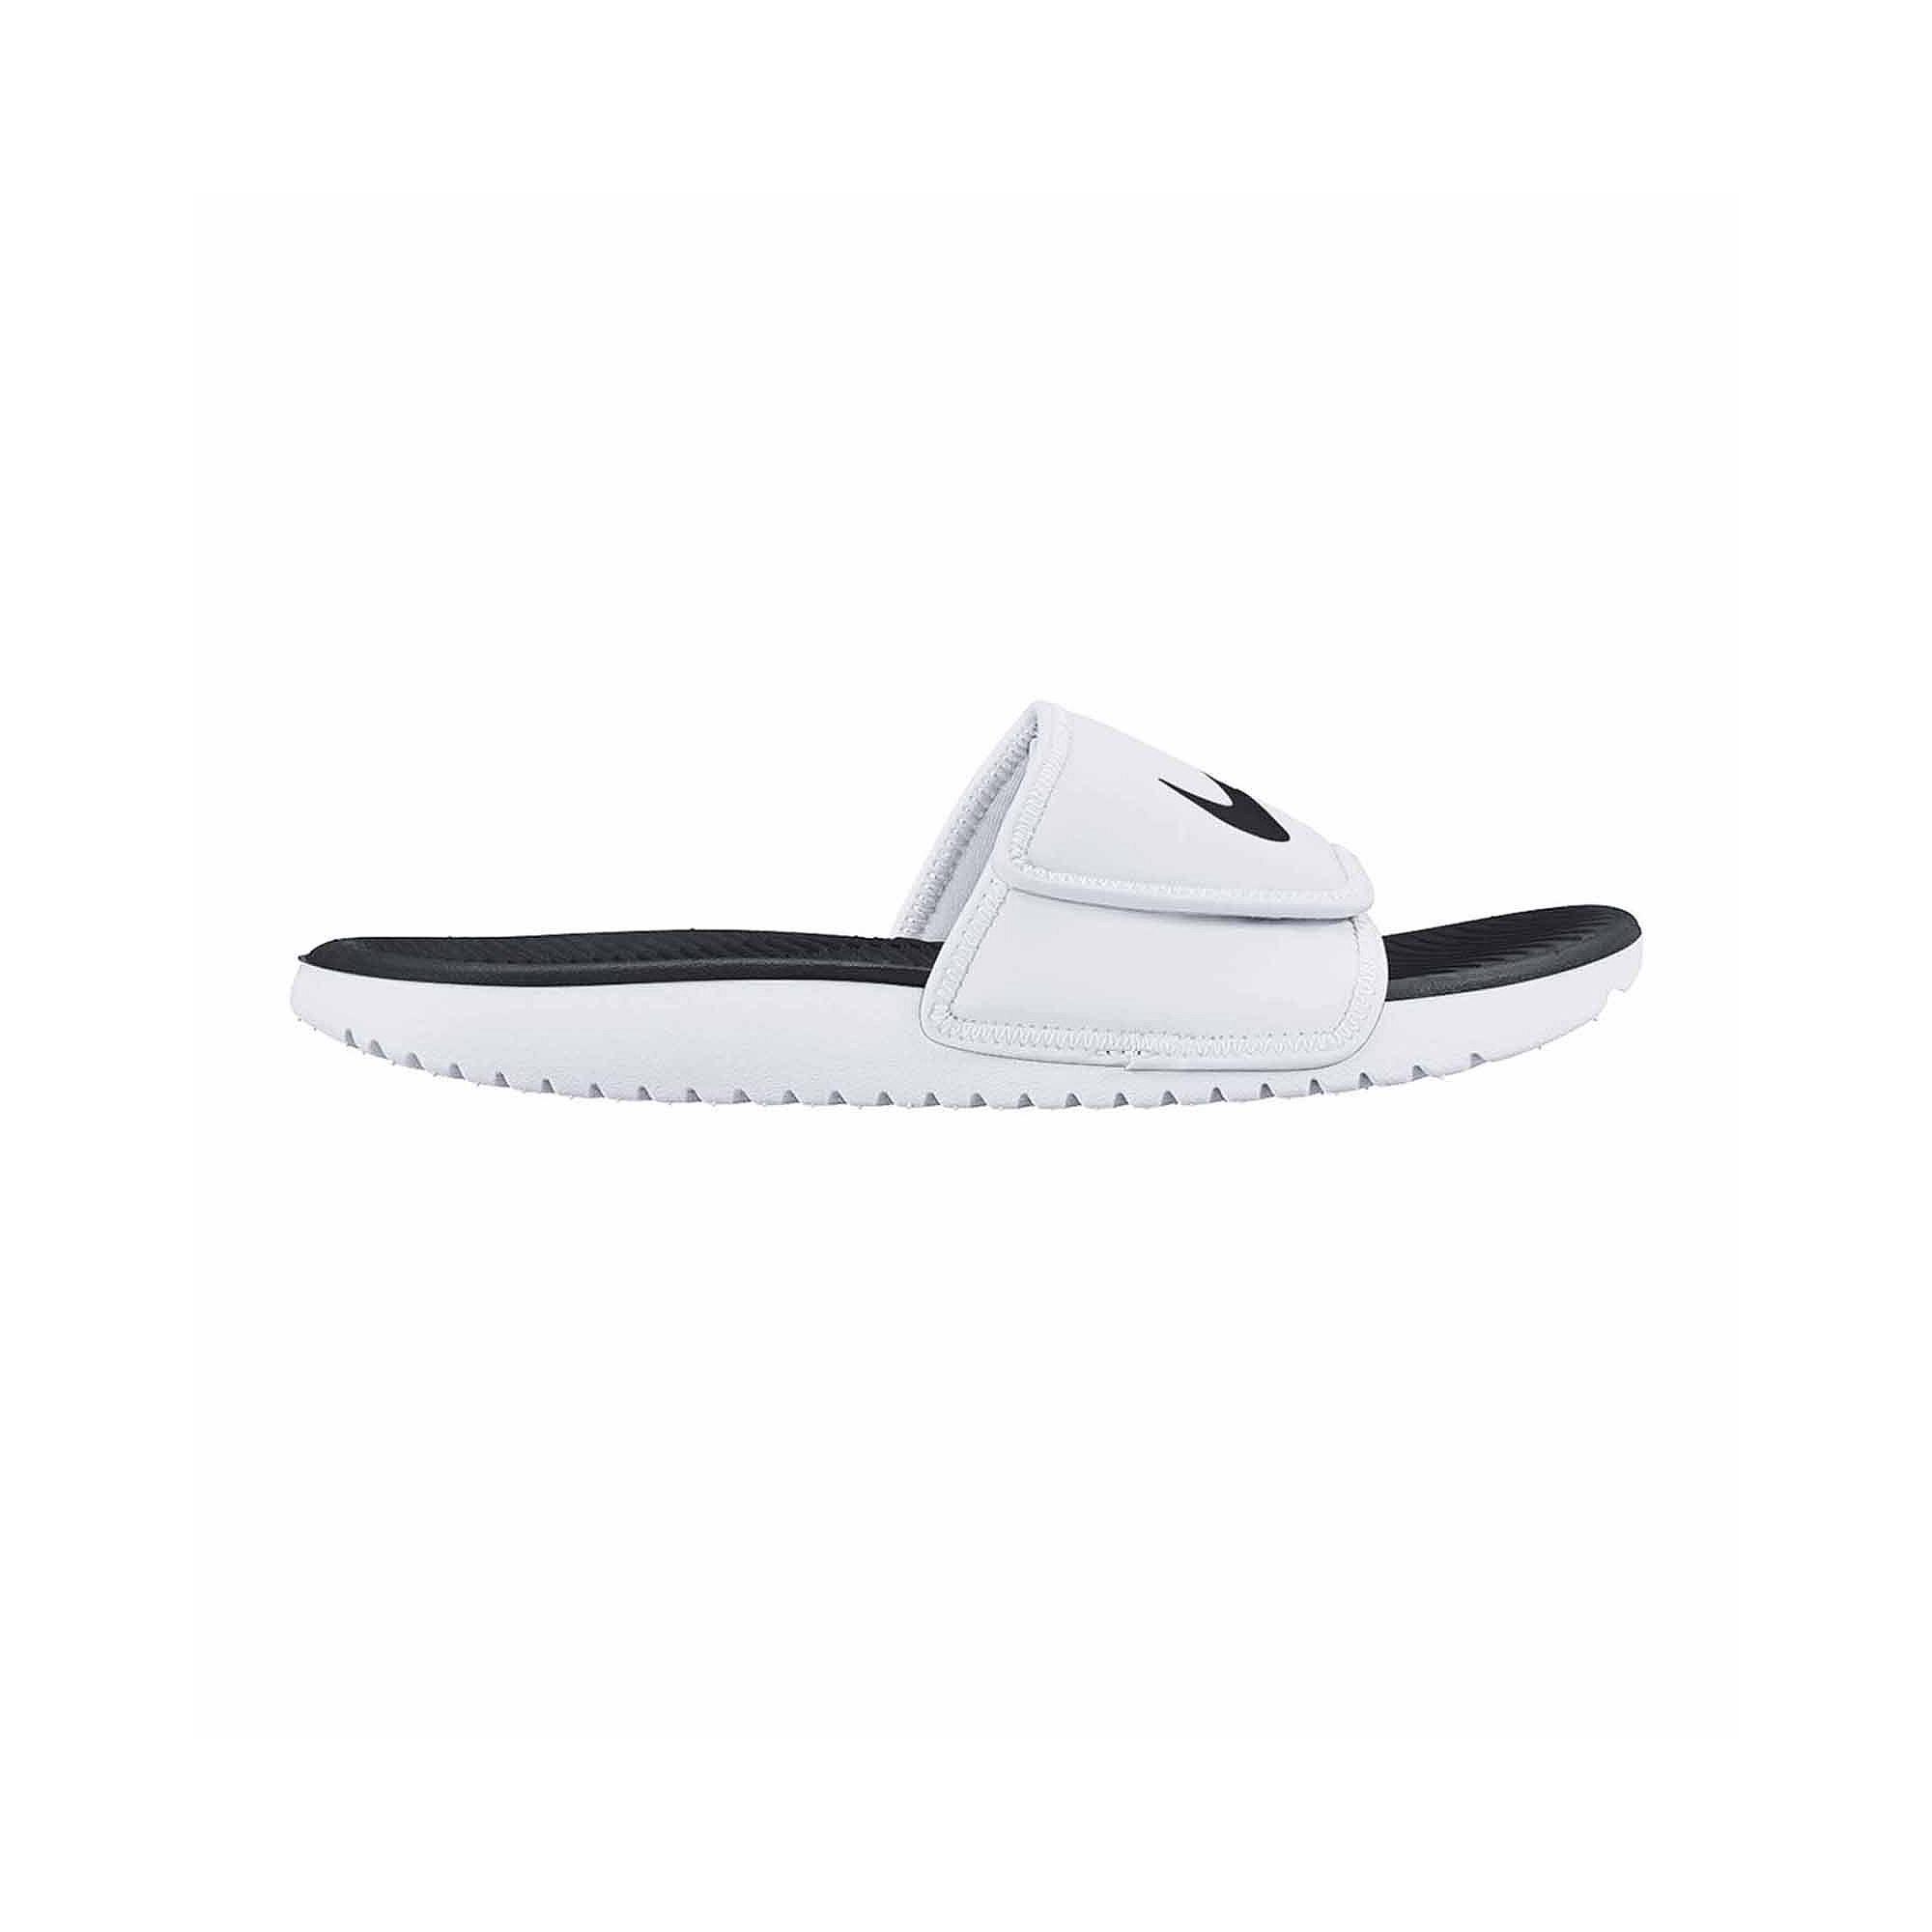 6d11d5ac617 ... UPC 886915125140 product image for Nike Kawa Adjust Slide Mens Water  Shoes